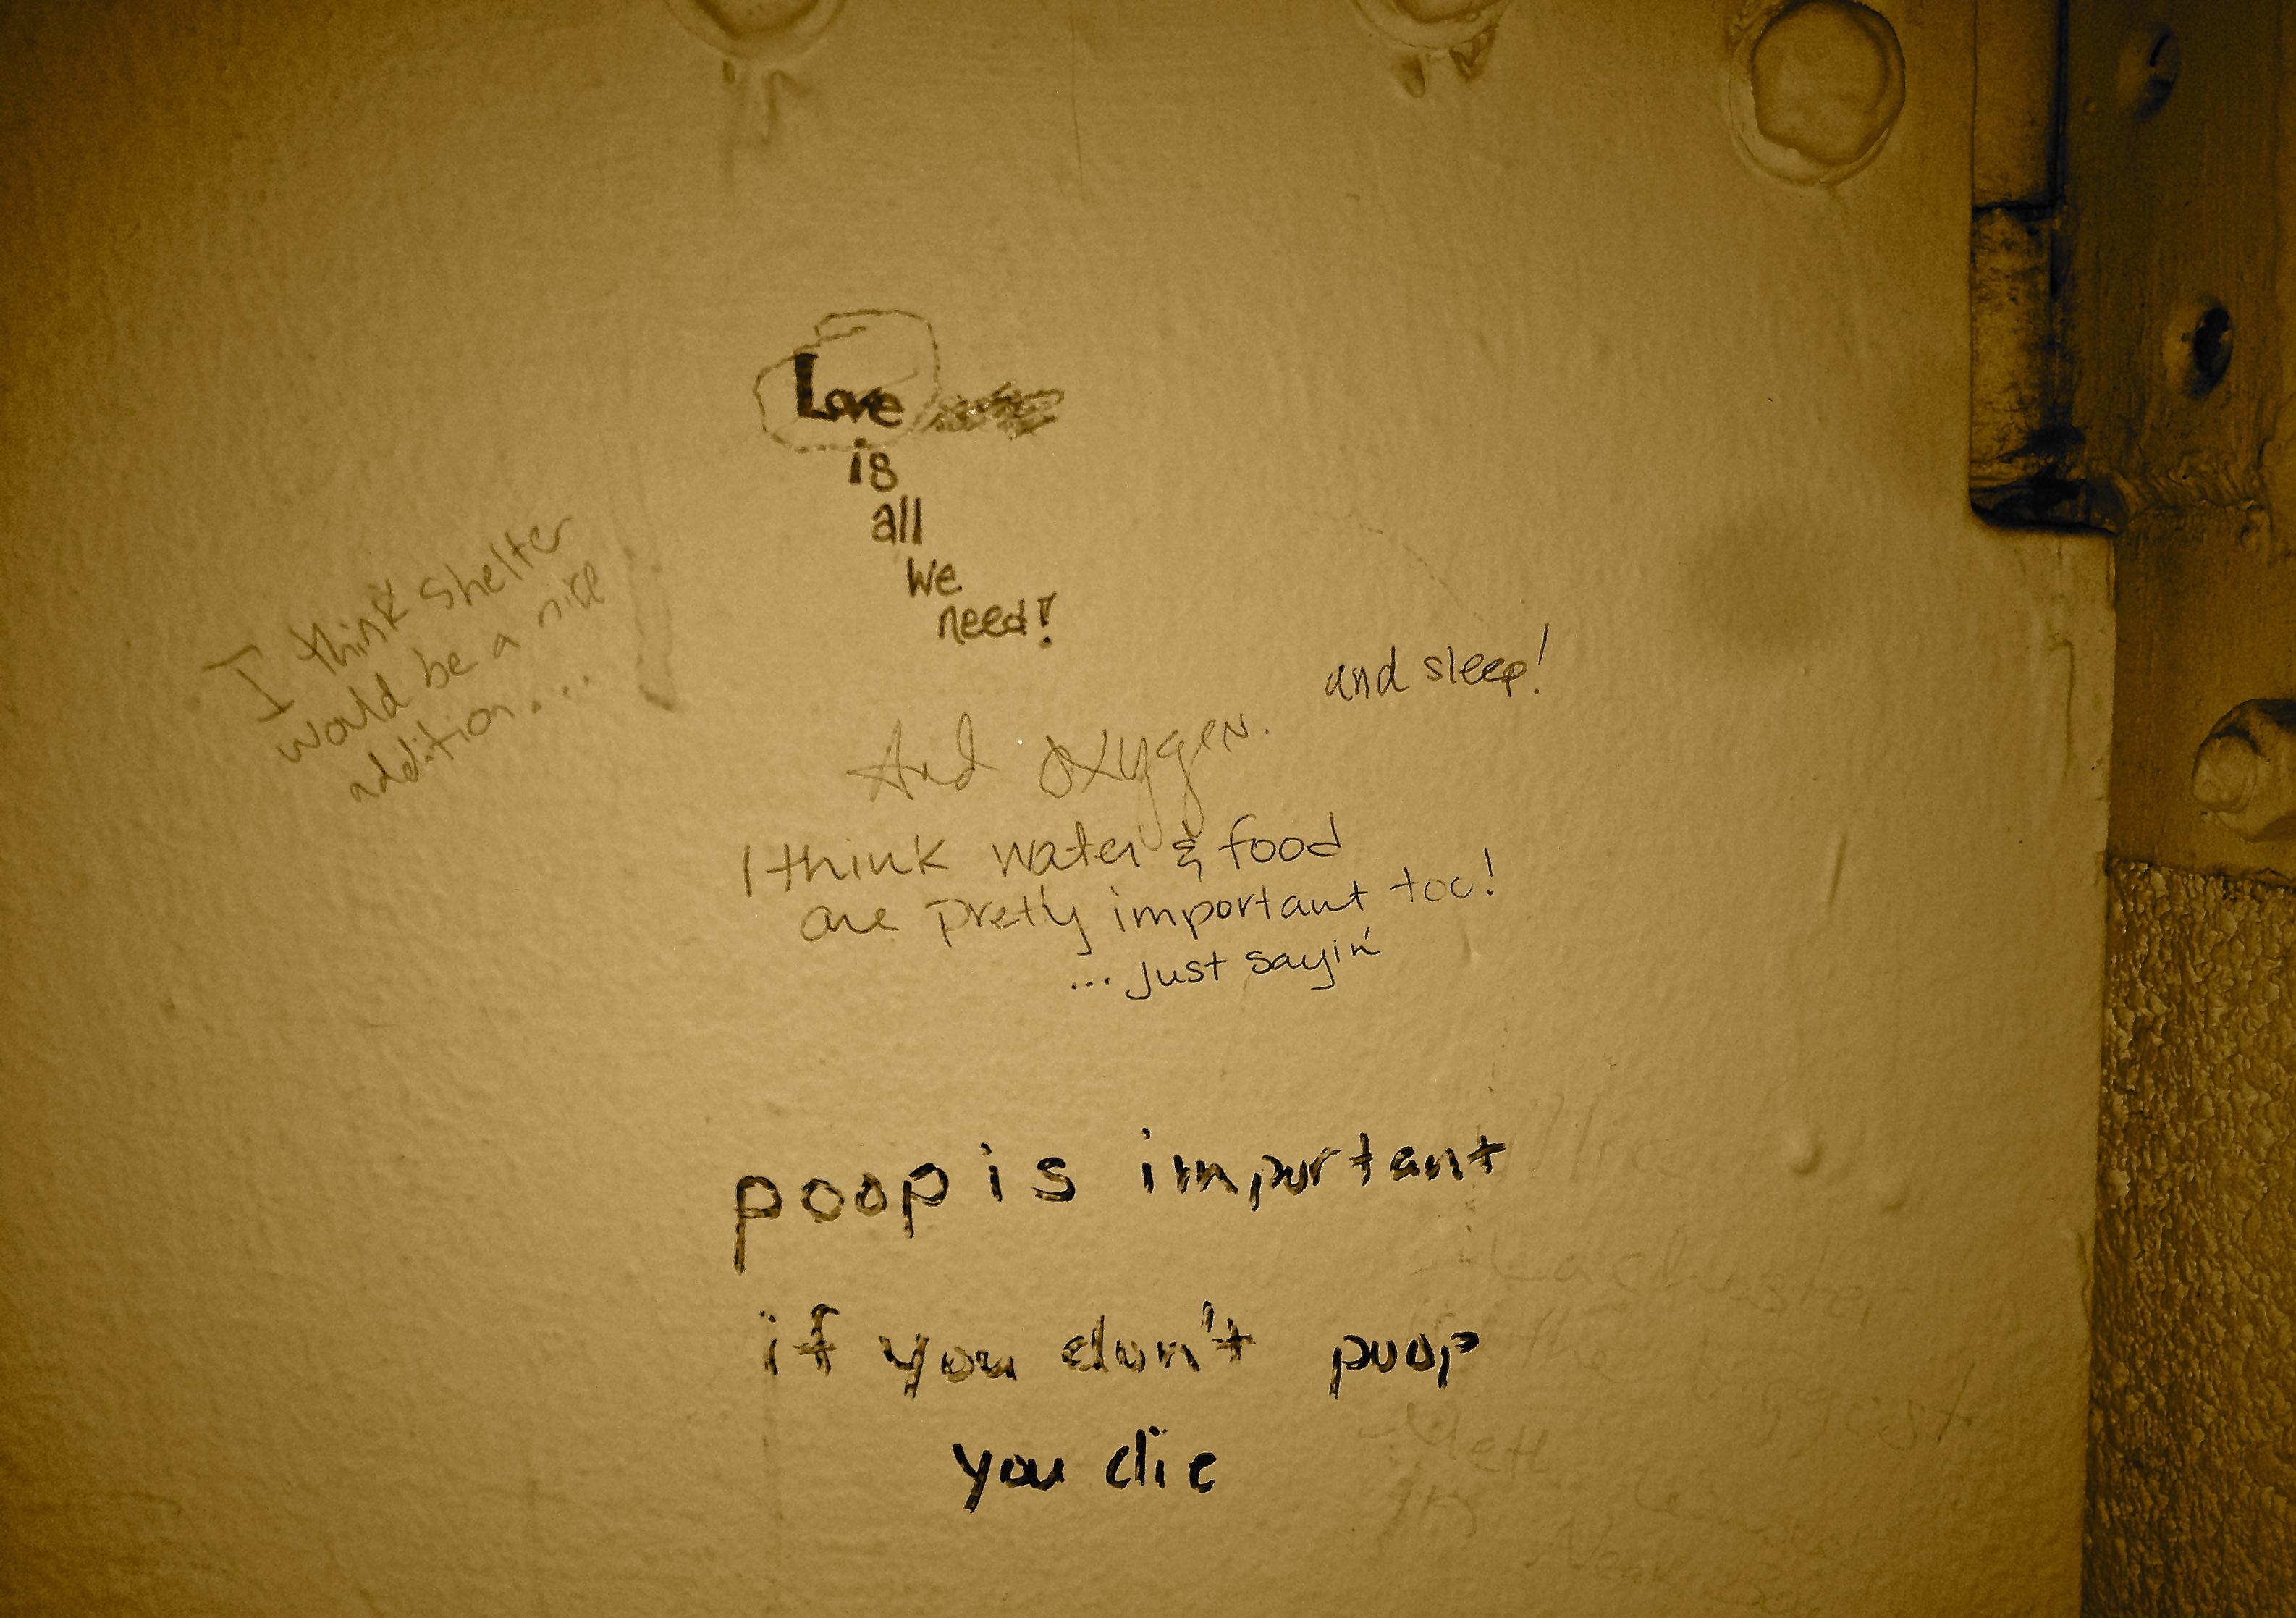 Bathroom Stall Wisdom what do we need? wisdom from a bathroom stall. – sarah zureick-brown